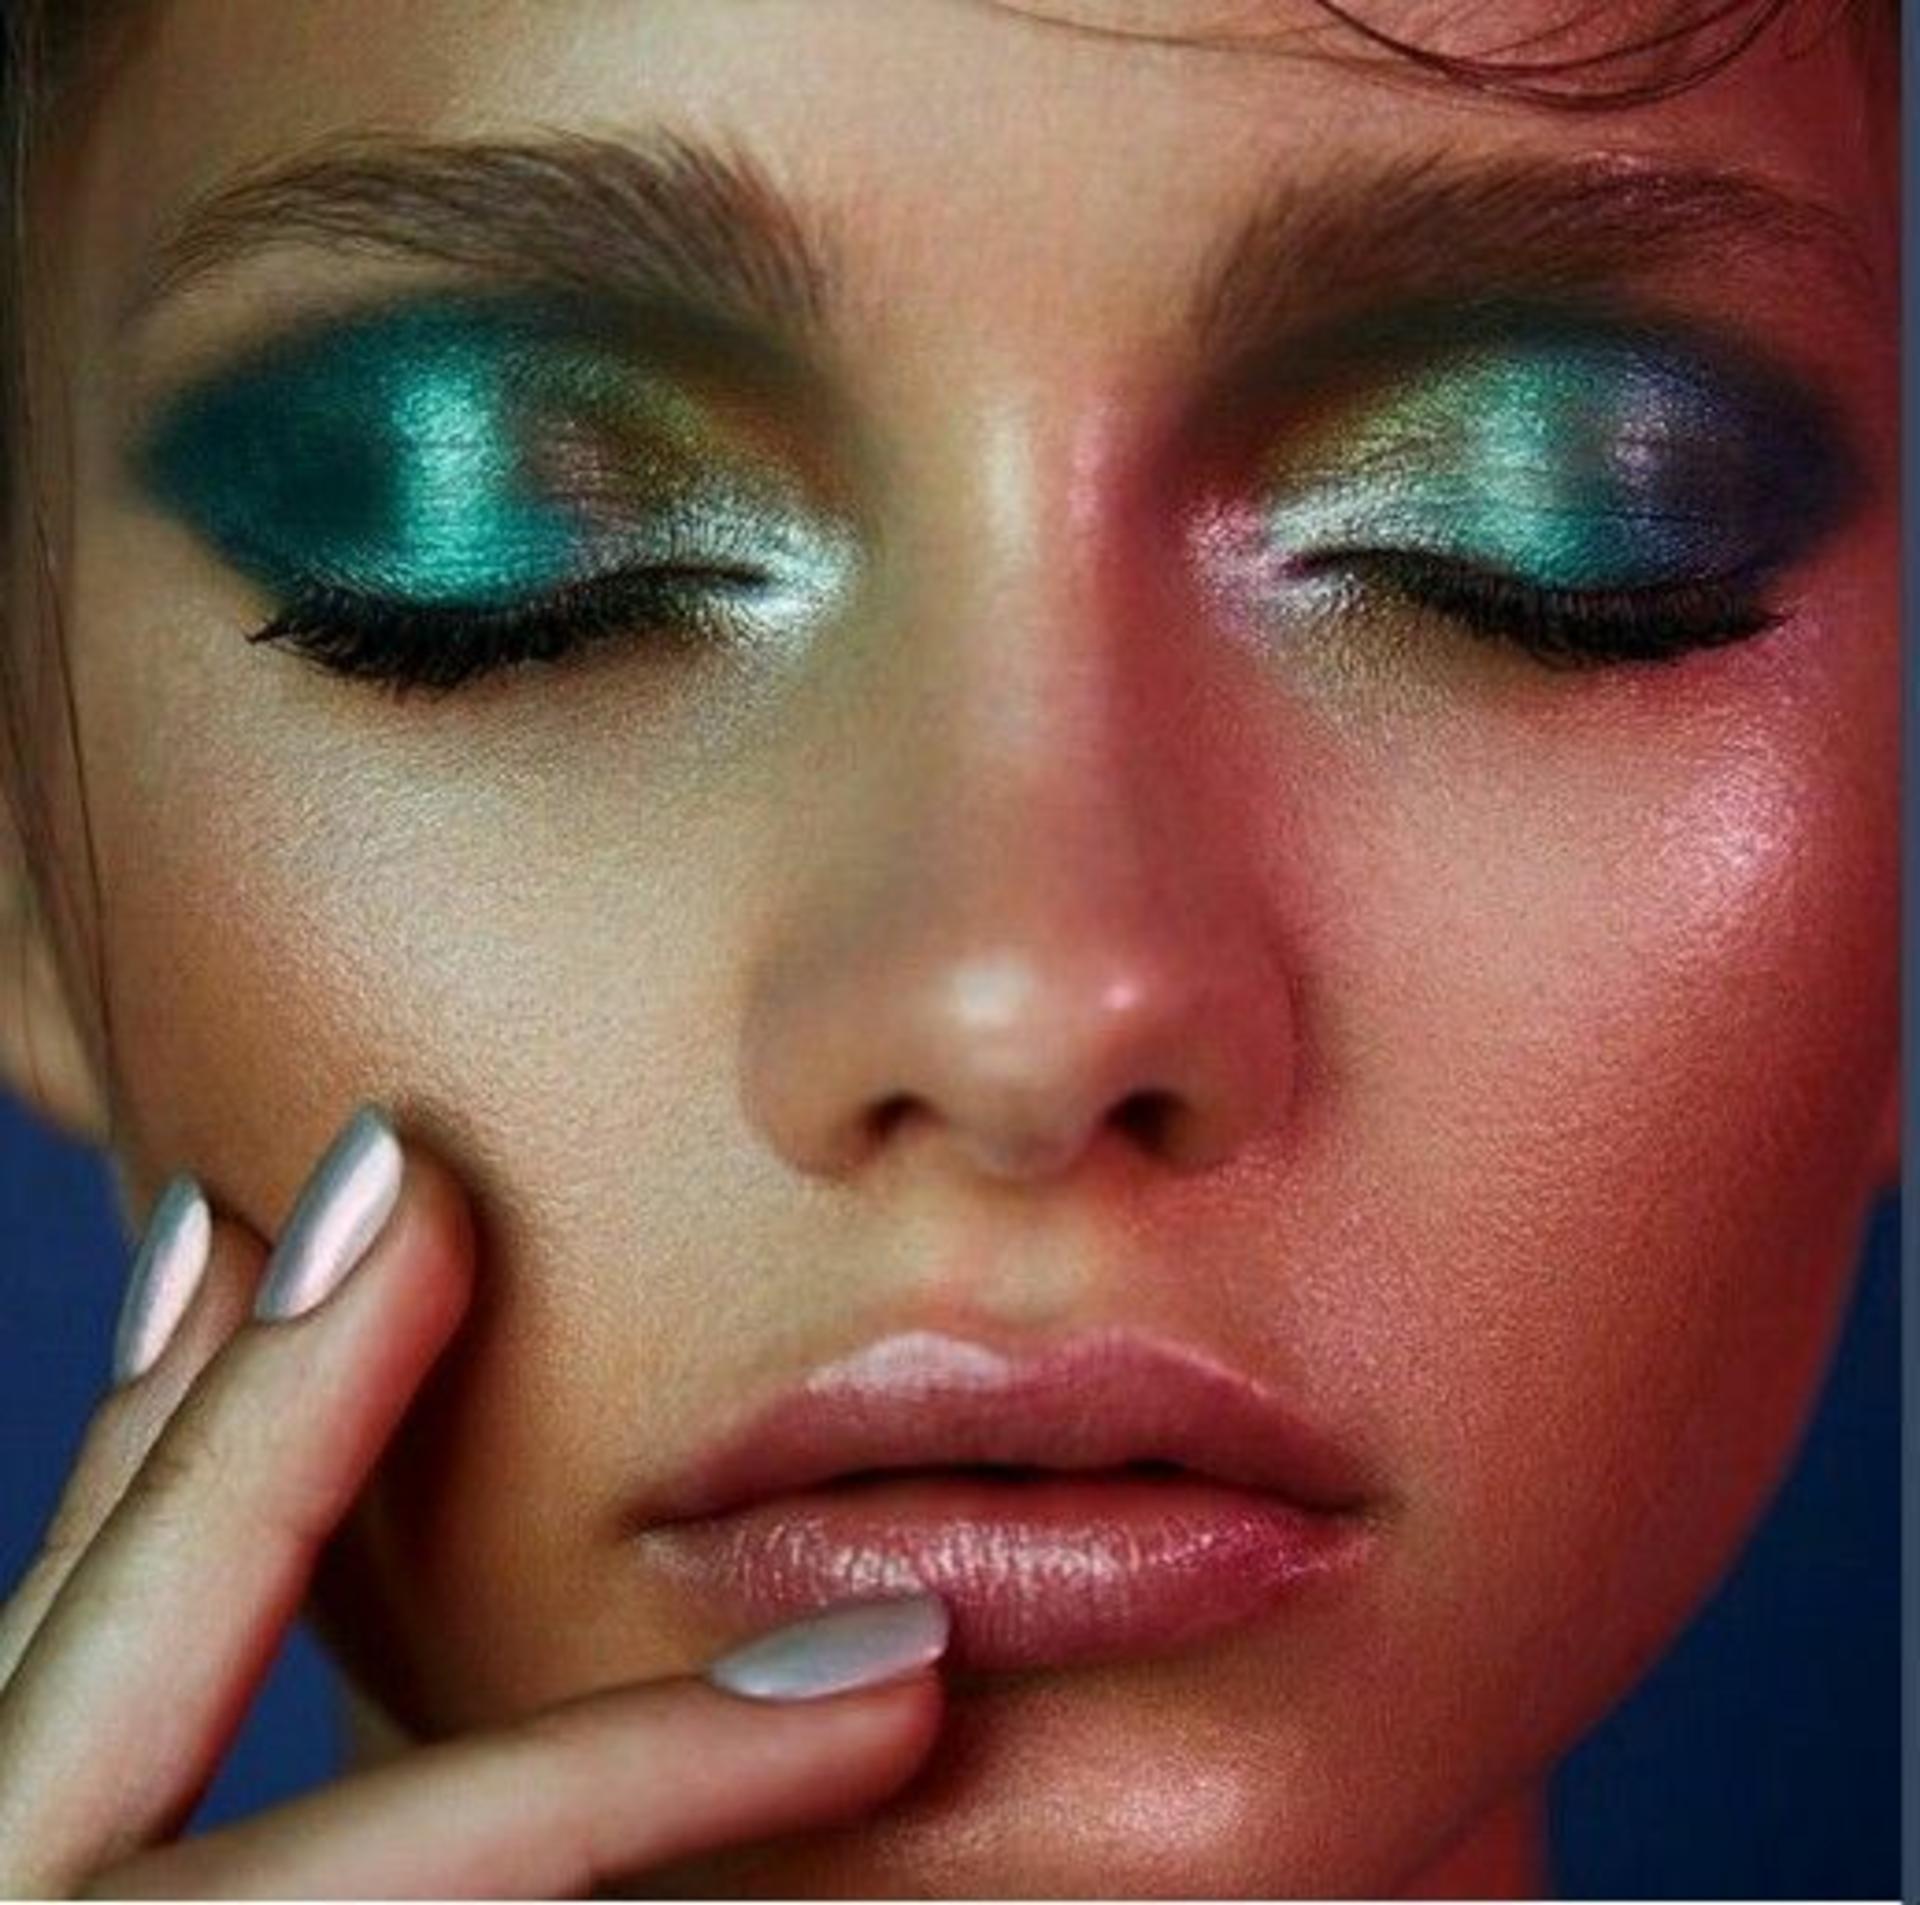 shopaholicpals - f2d935d4fdee5ee580743995a2e53907--aqua-eyeshadow-metallic-eye-makeup